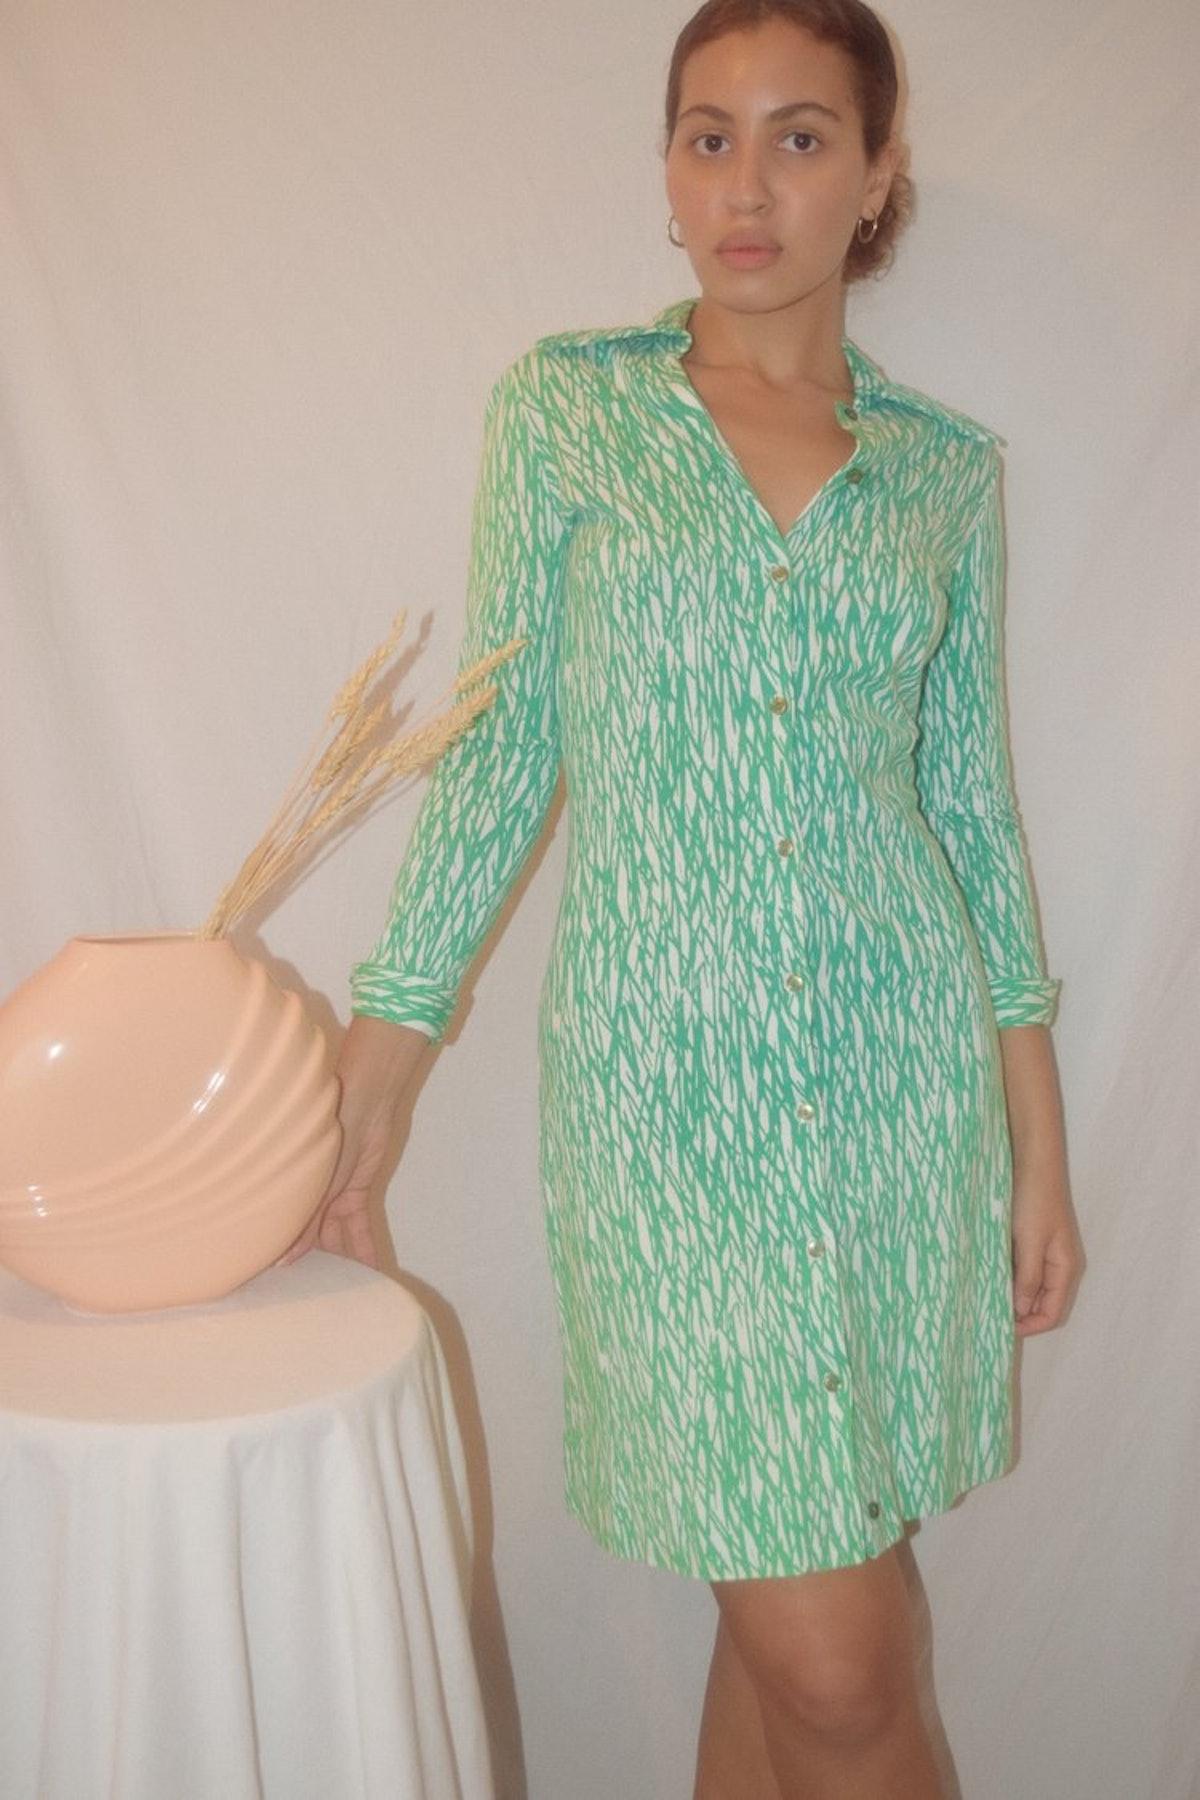 Vintage 1970s DVF Green Twig Print Knit Dress